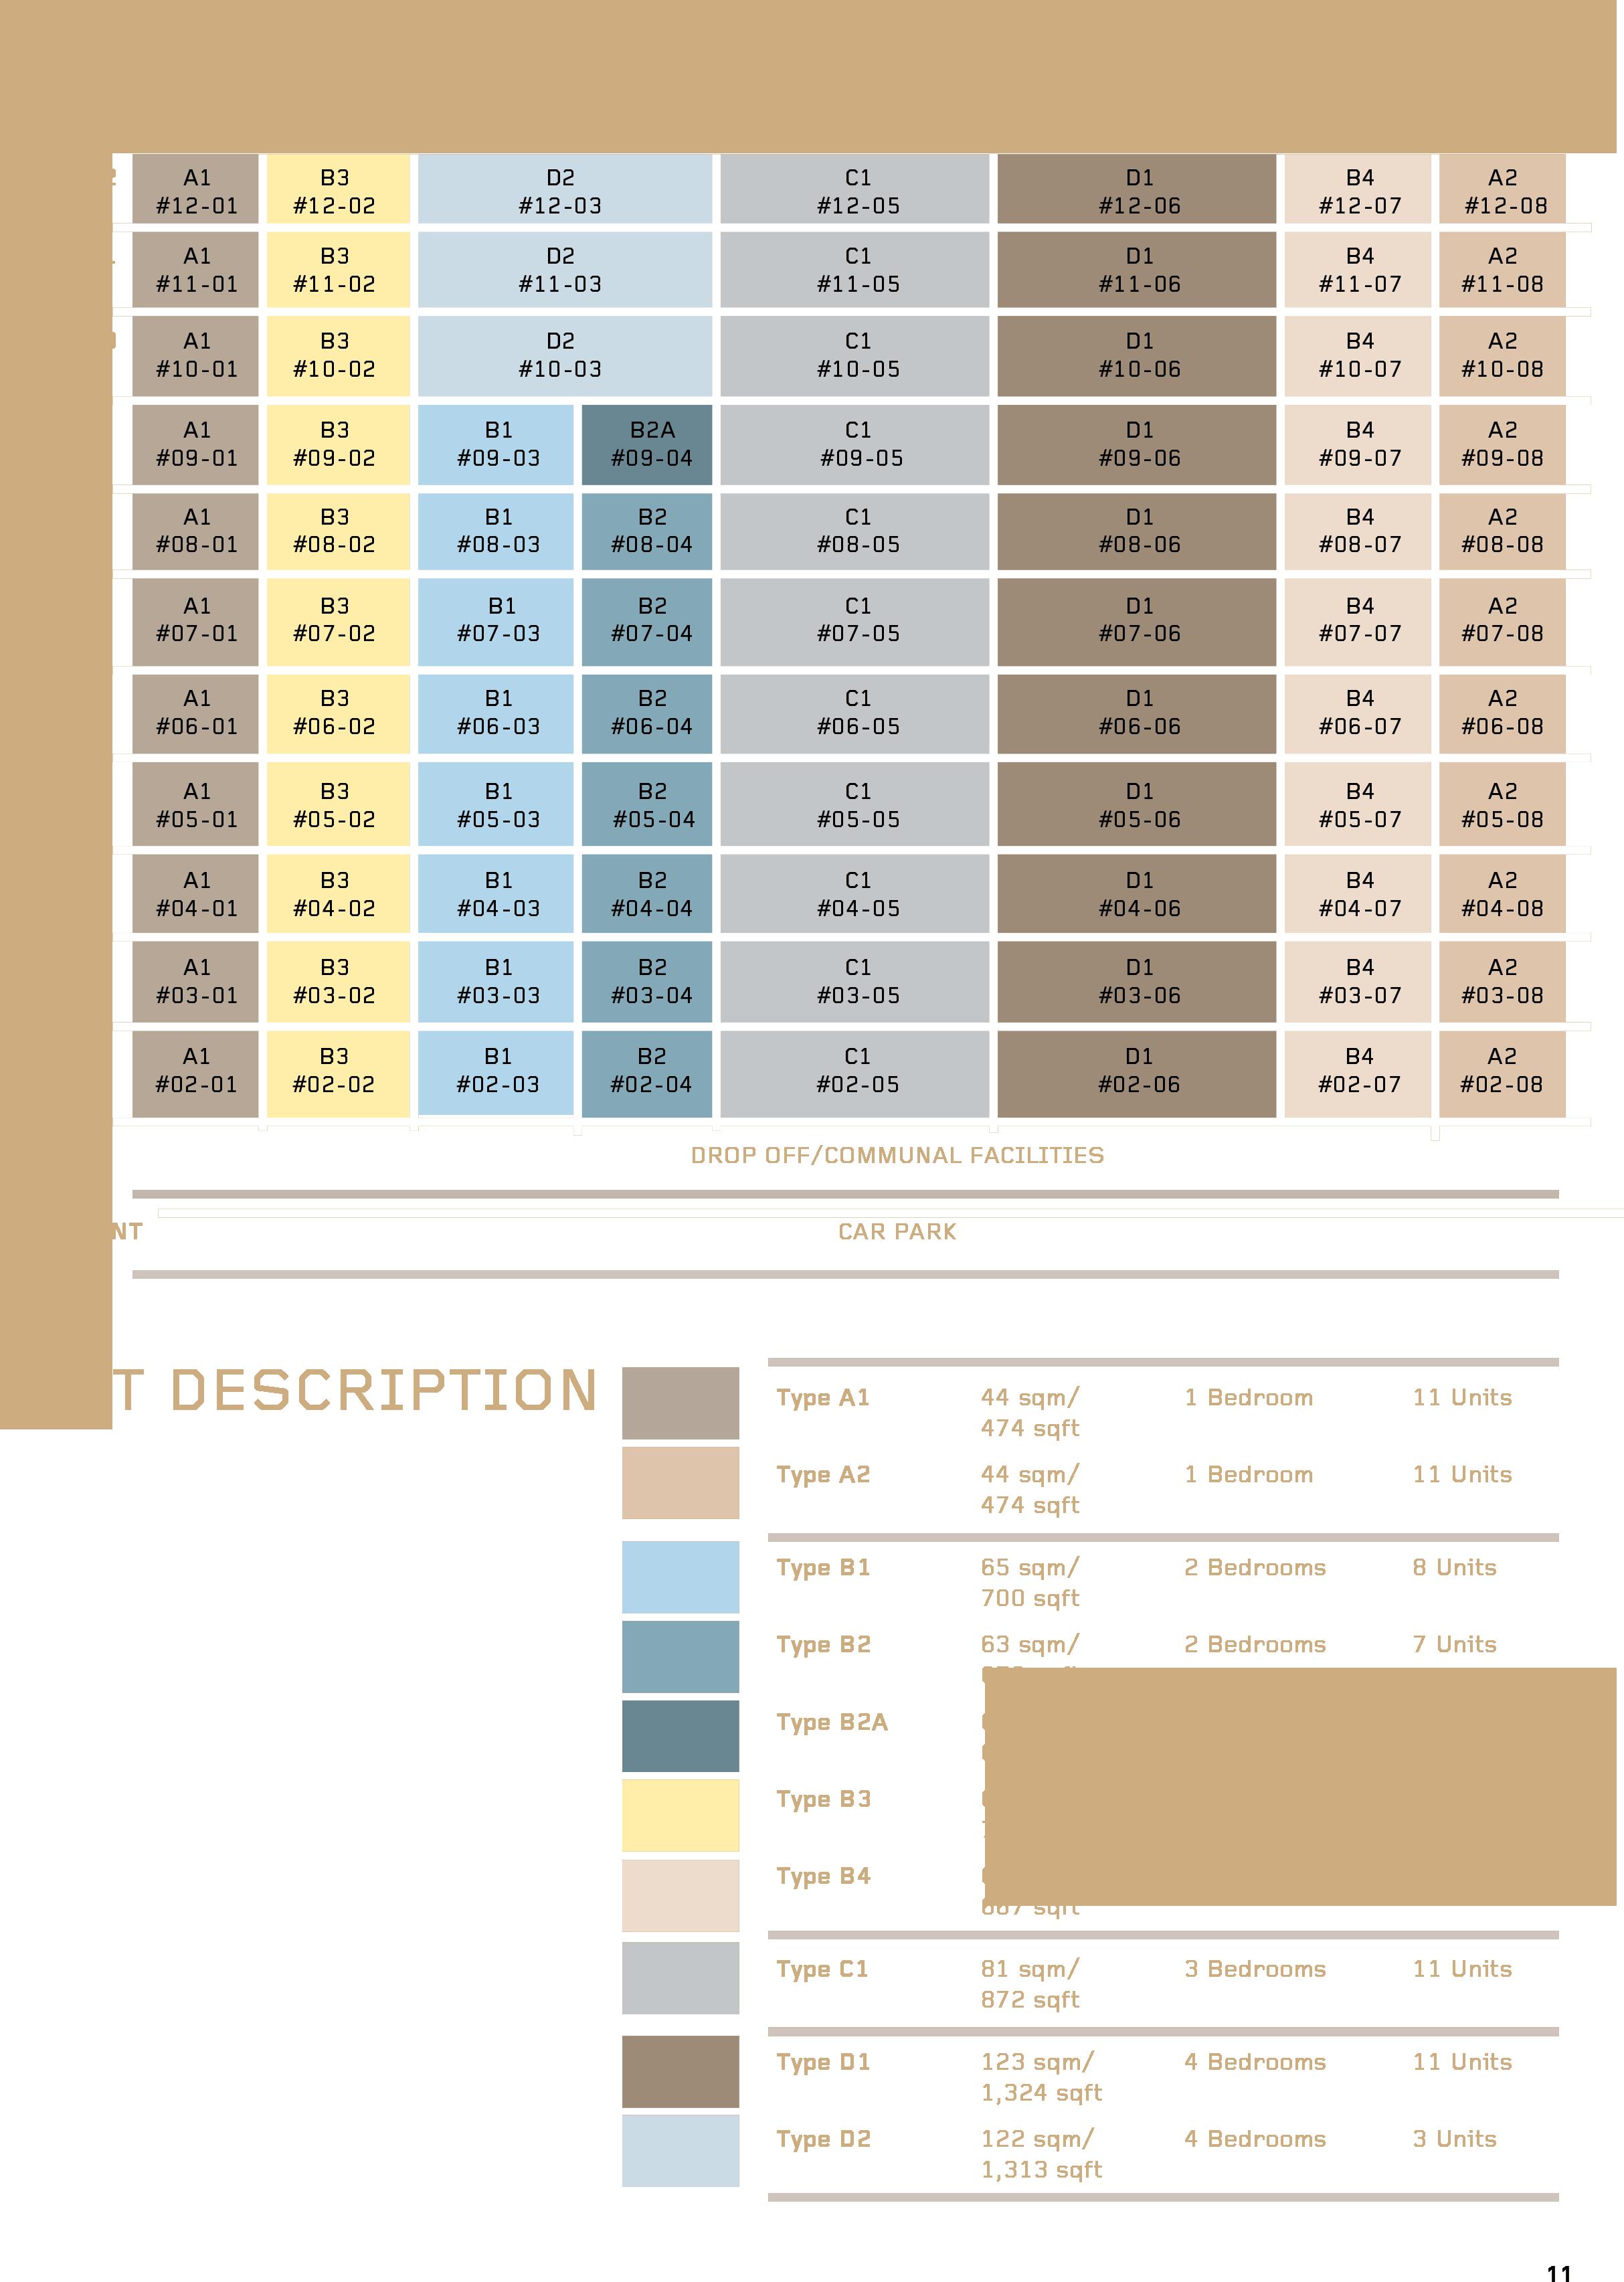 MYRA Condo Elevation Chart